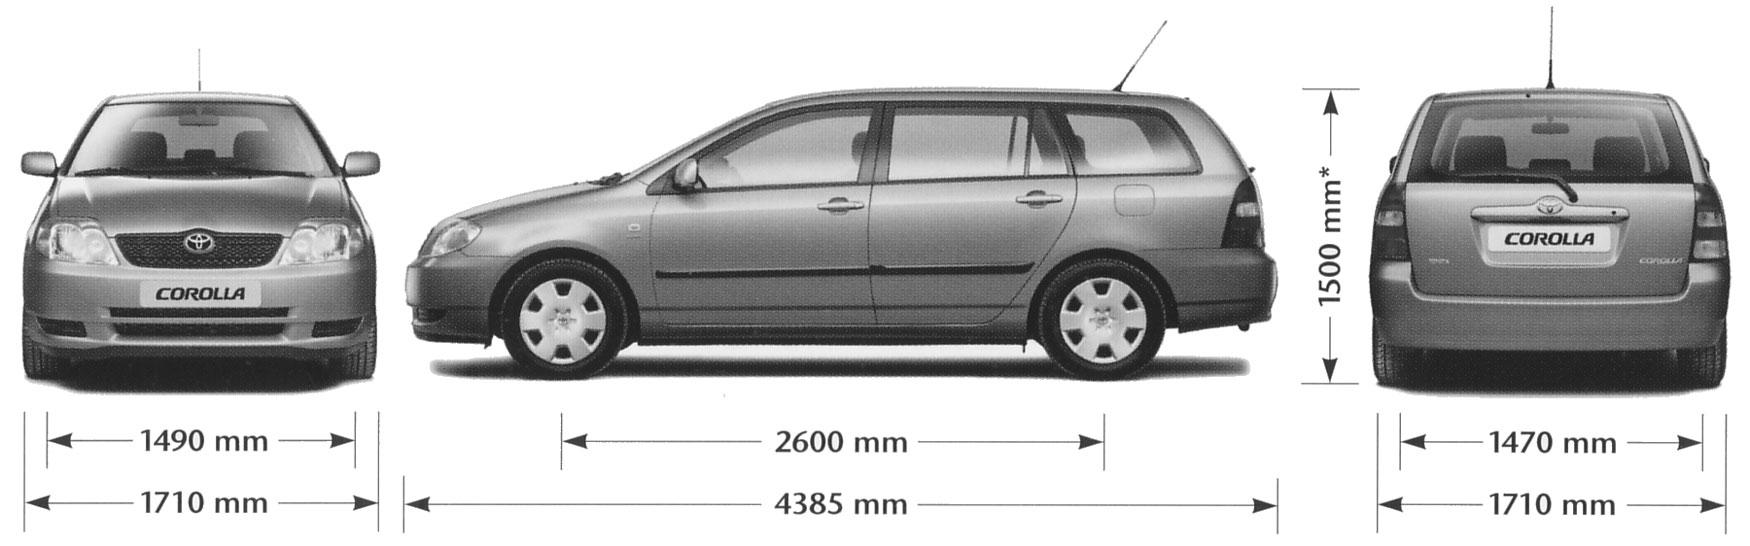 2001 toyota corolla wagon blueprints free outlines rh getoutlines com Toyota Yaris Toyota Yaris